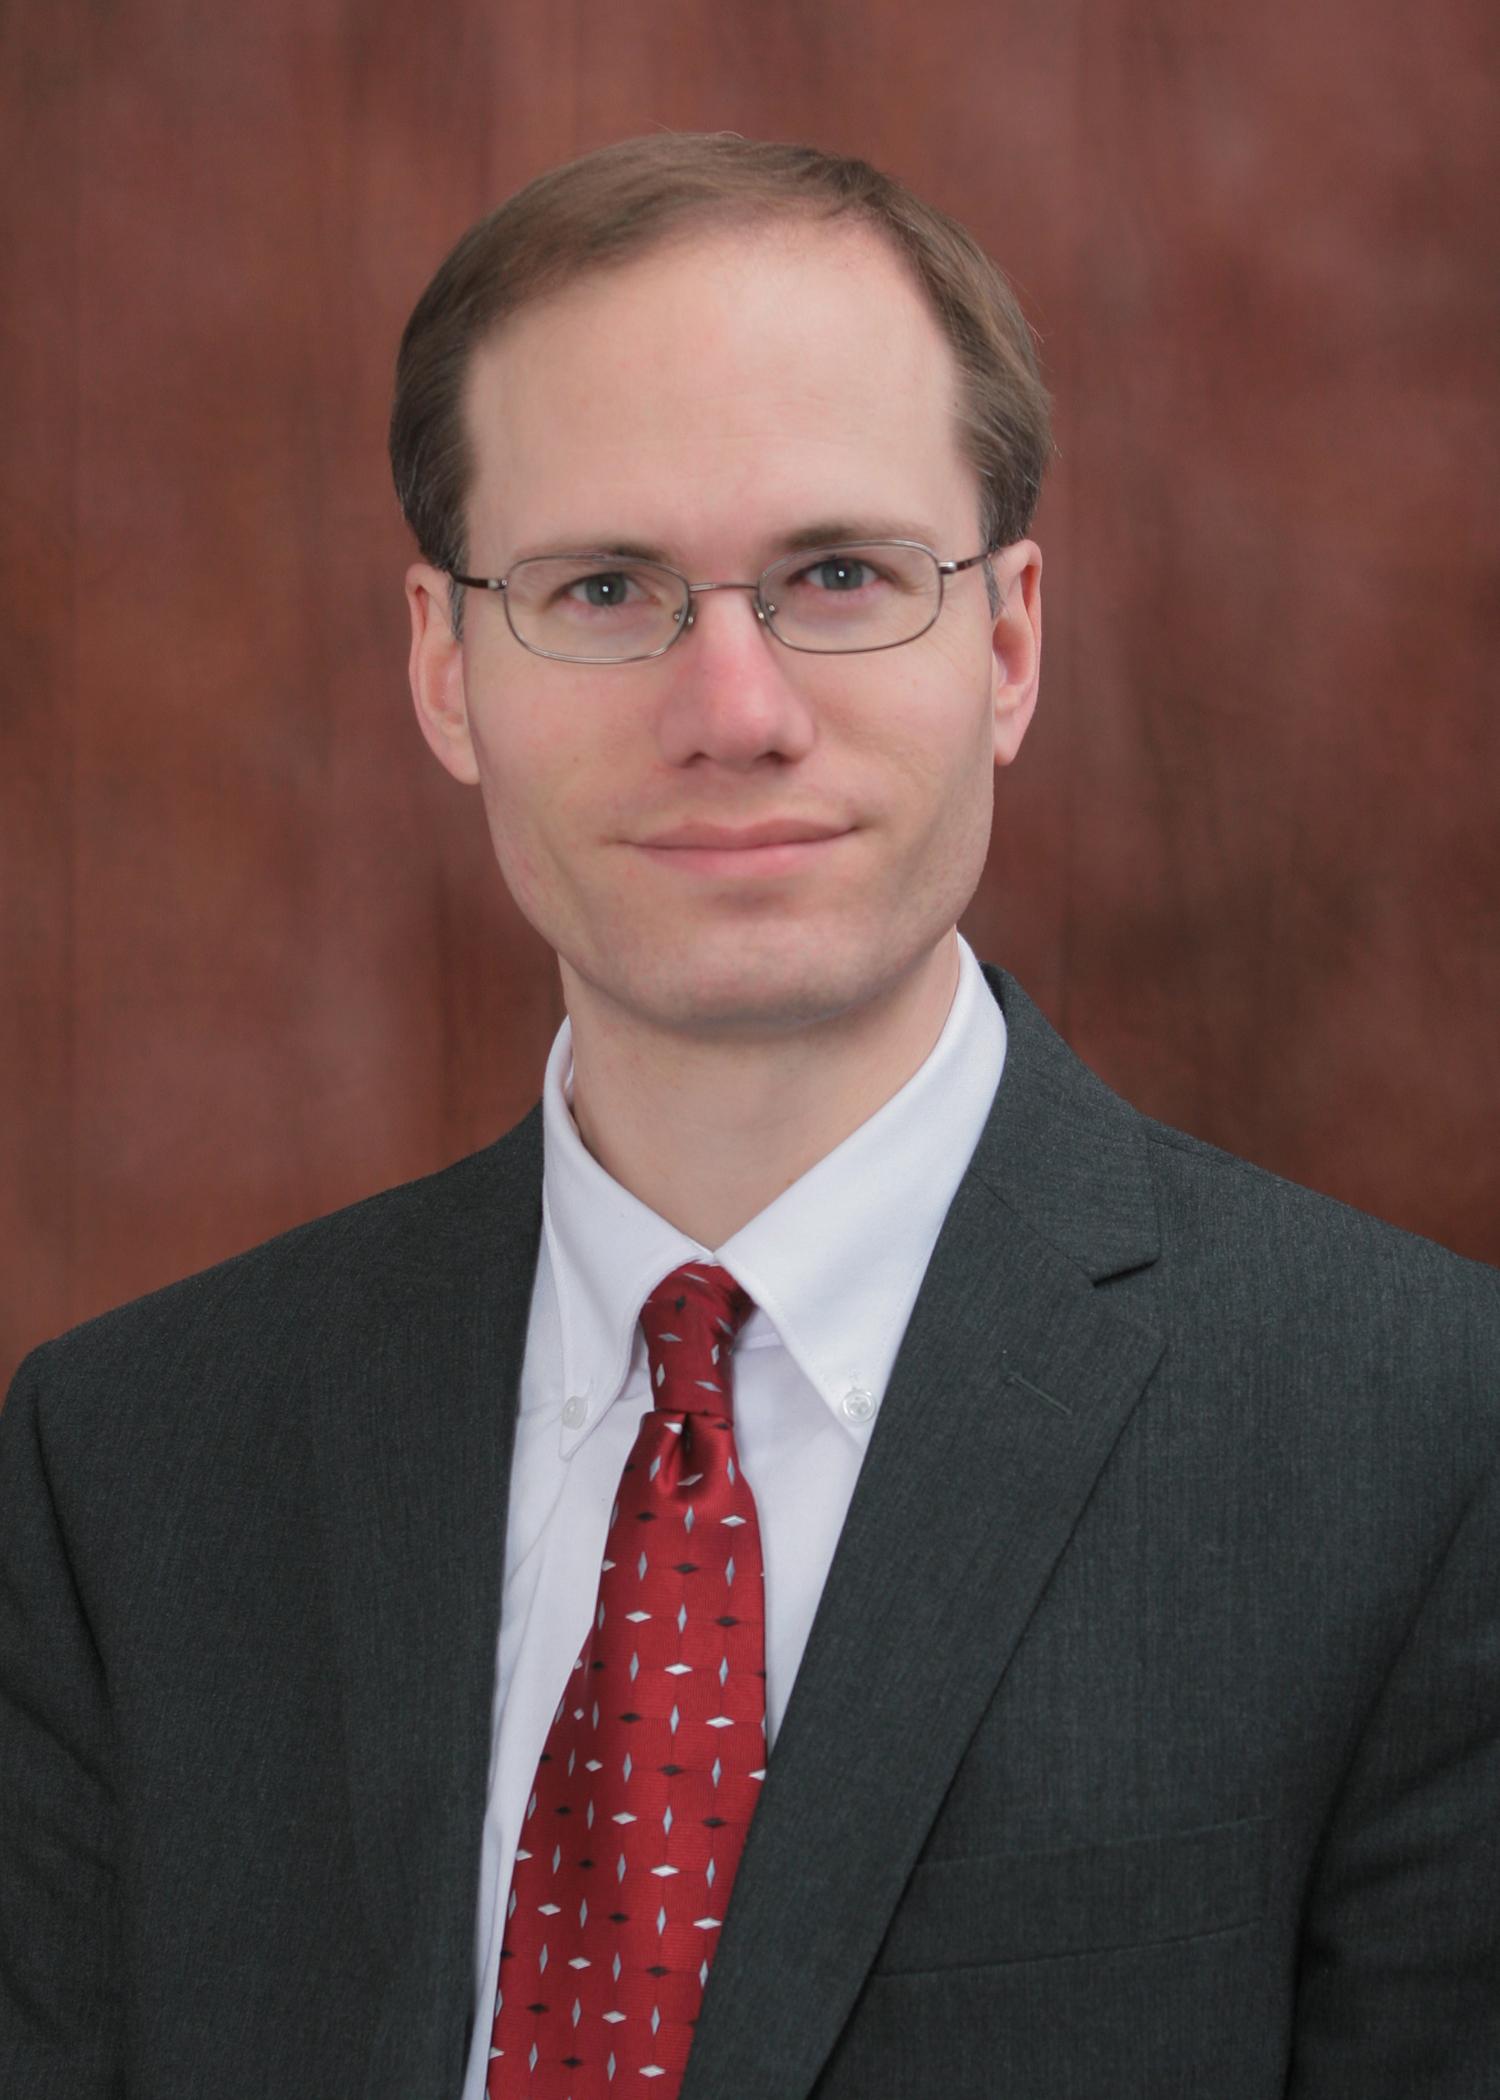 Gary L. Blickhan, CPA